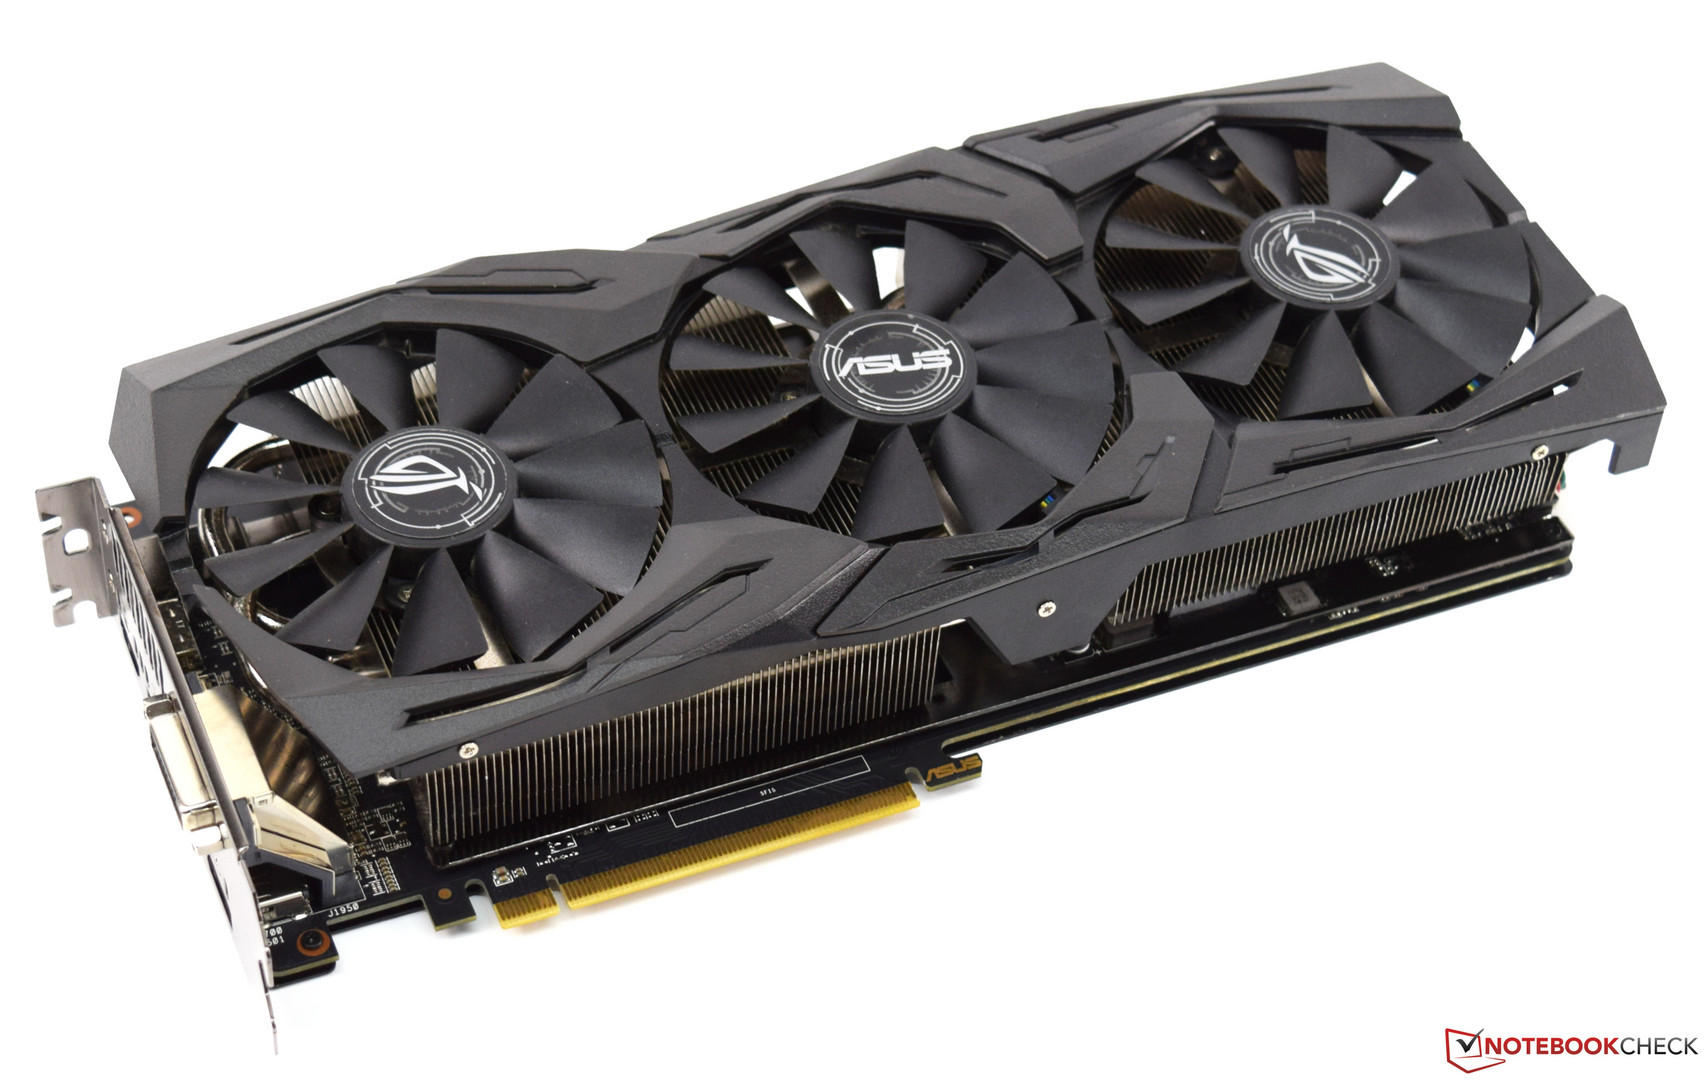 OPEN BOX ASUS ROG Strix Radeon RX570 4G OC GAMING VR Ready